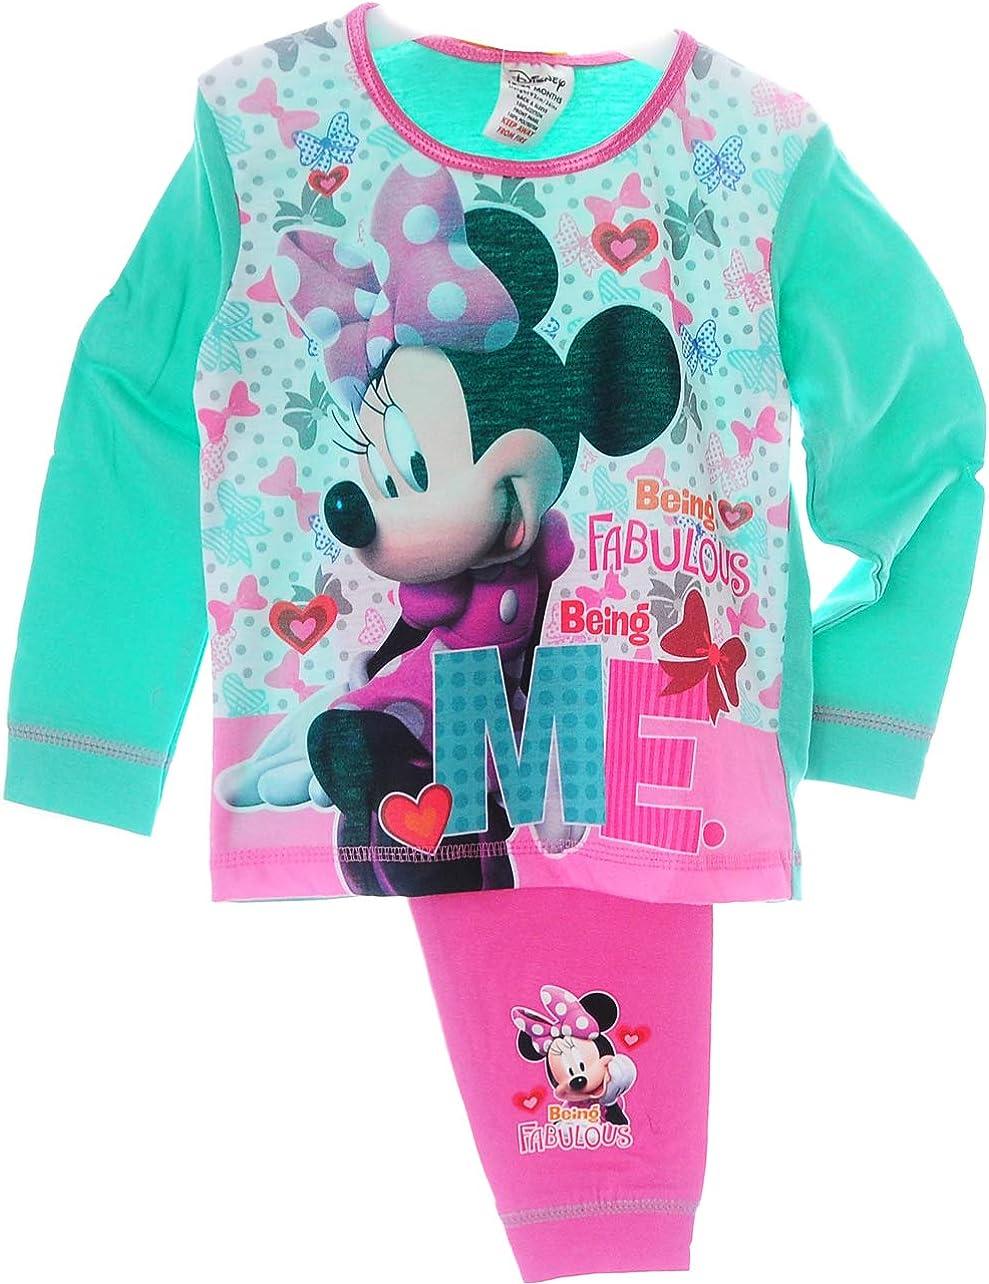 Minnie Mouse Baby Kinder Pyjama Schlafanzug Set Shirt Hose Rosa